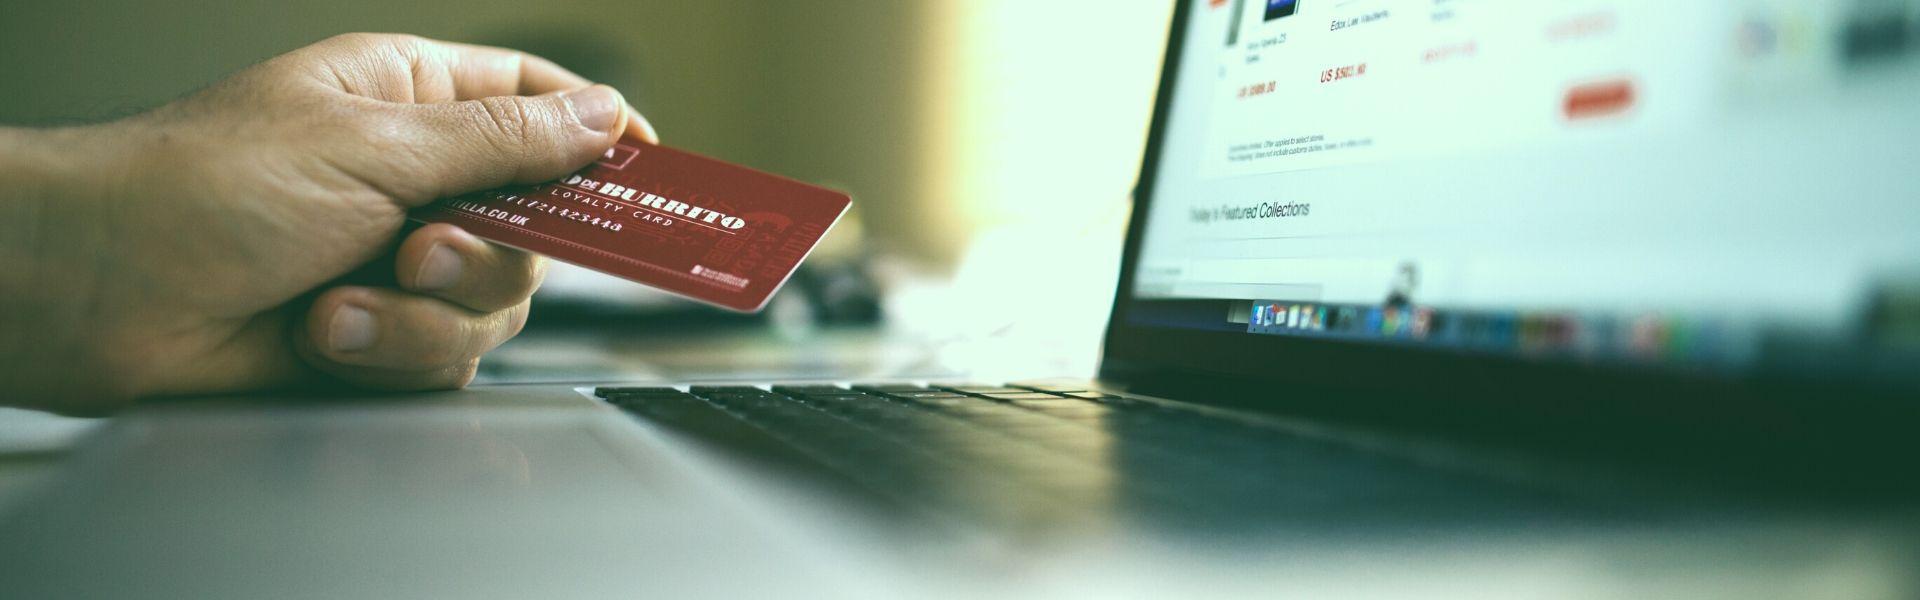 Ecommerce e Click & Collect